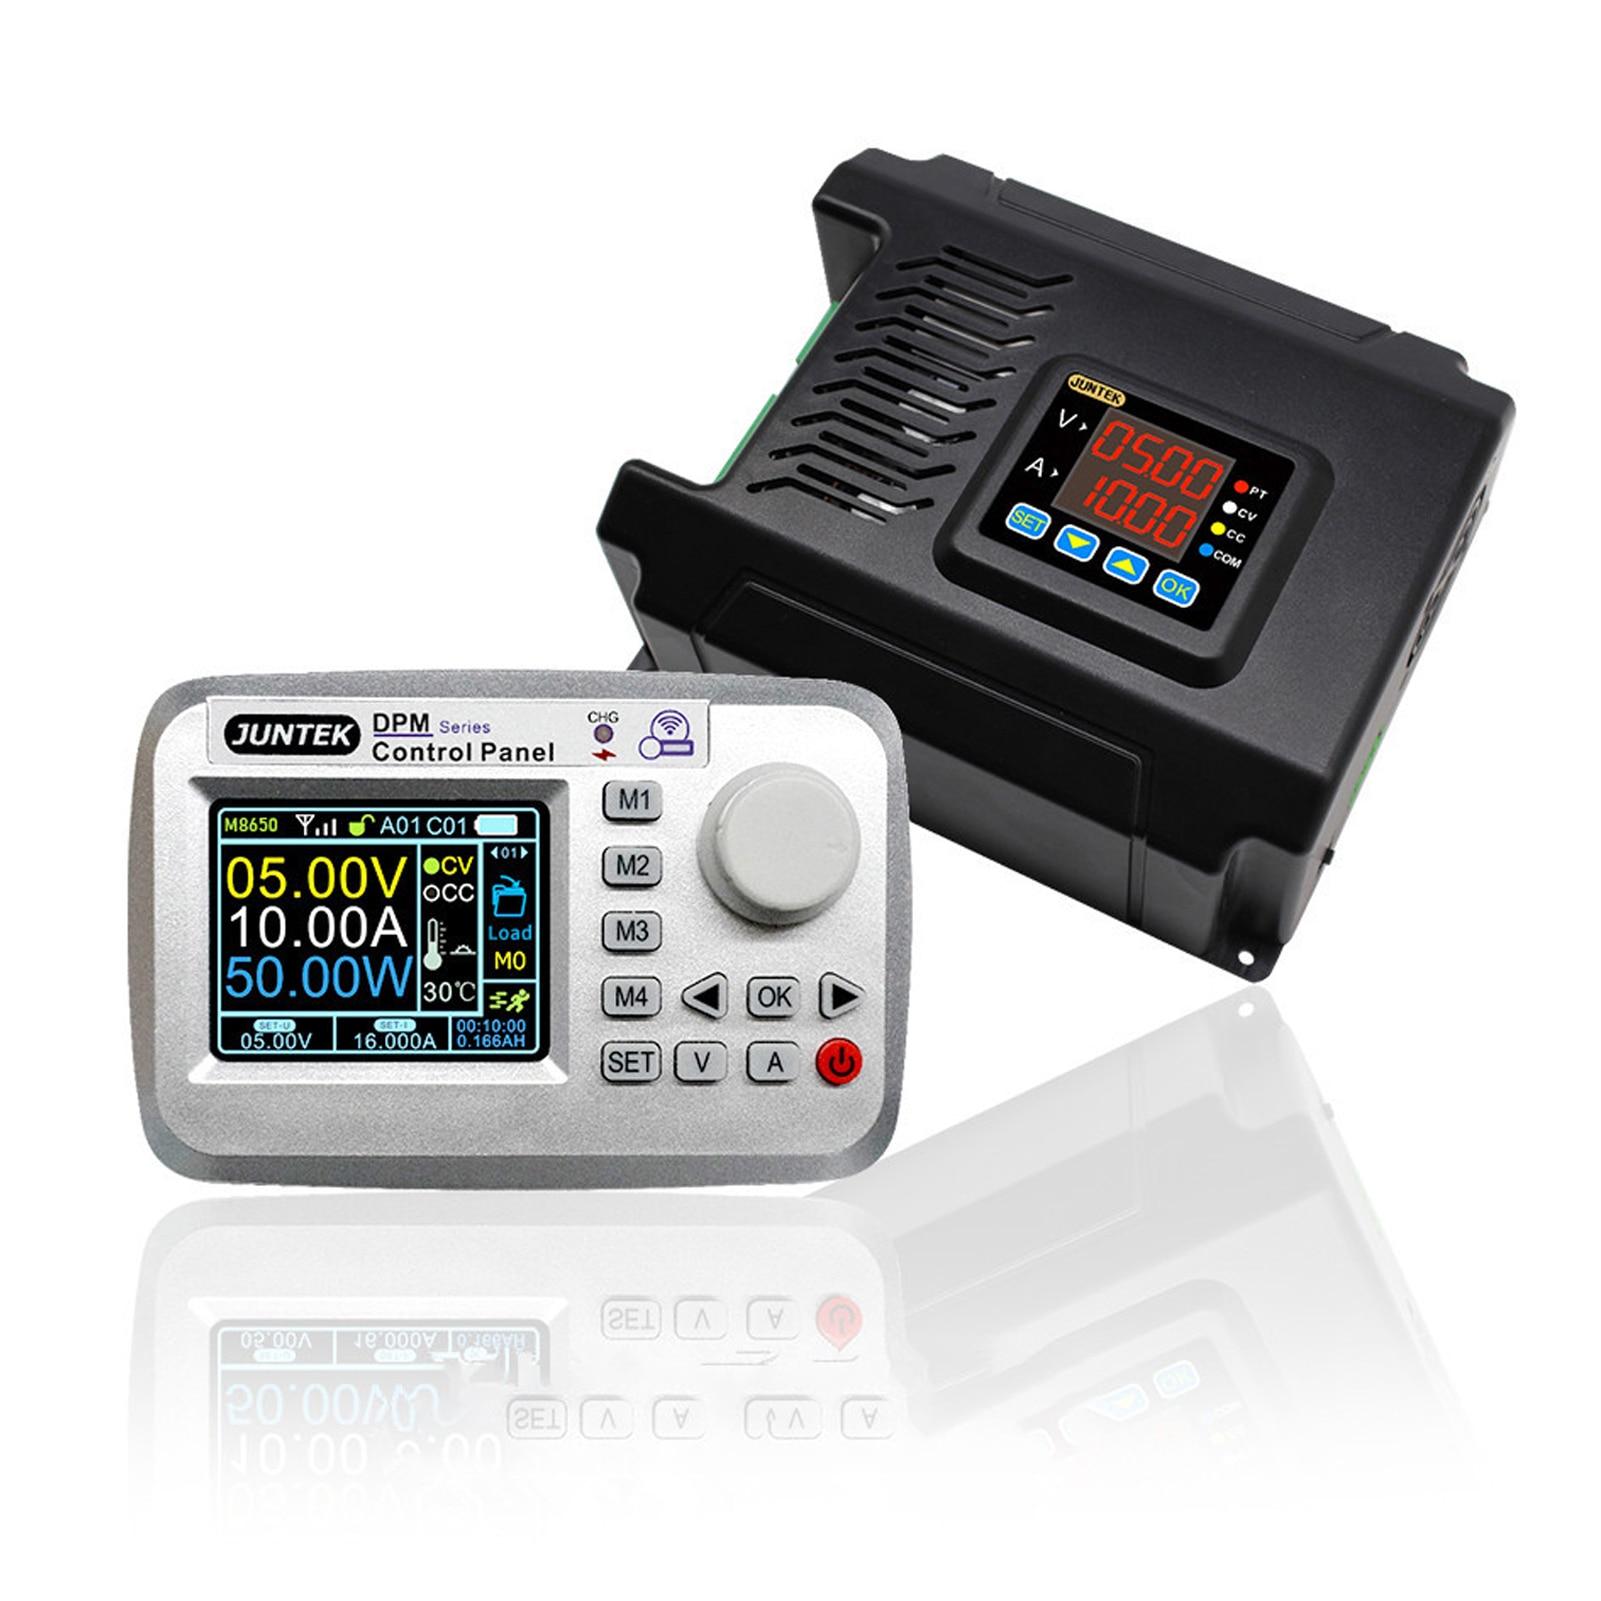 JUNTEK DPM8650-485RF 2.4 بوصة LCD 60V 50A RC الفولتميتر DC-DC امدادات الطاقة الجهد منظم تيار مستمر تحويل وحدة